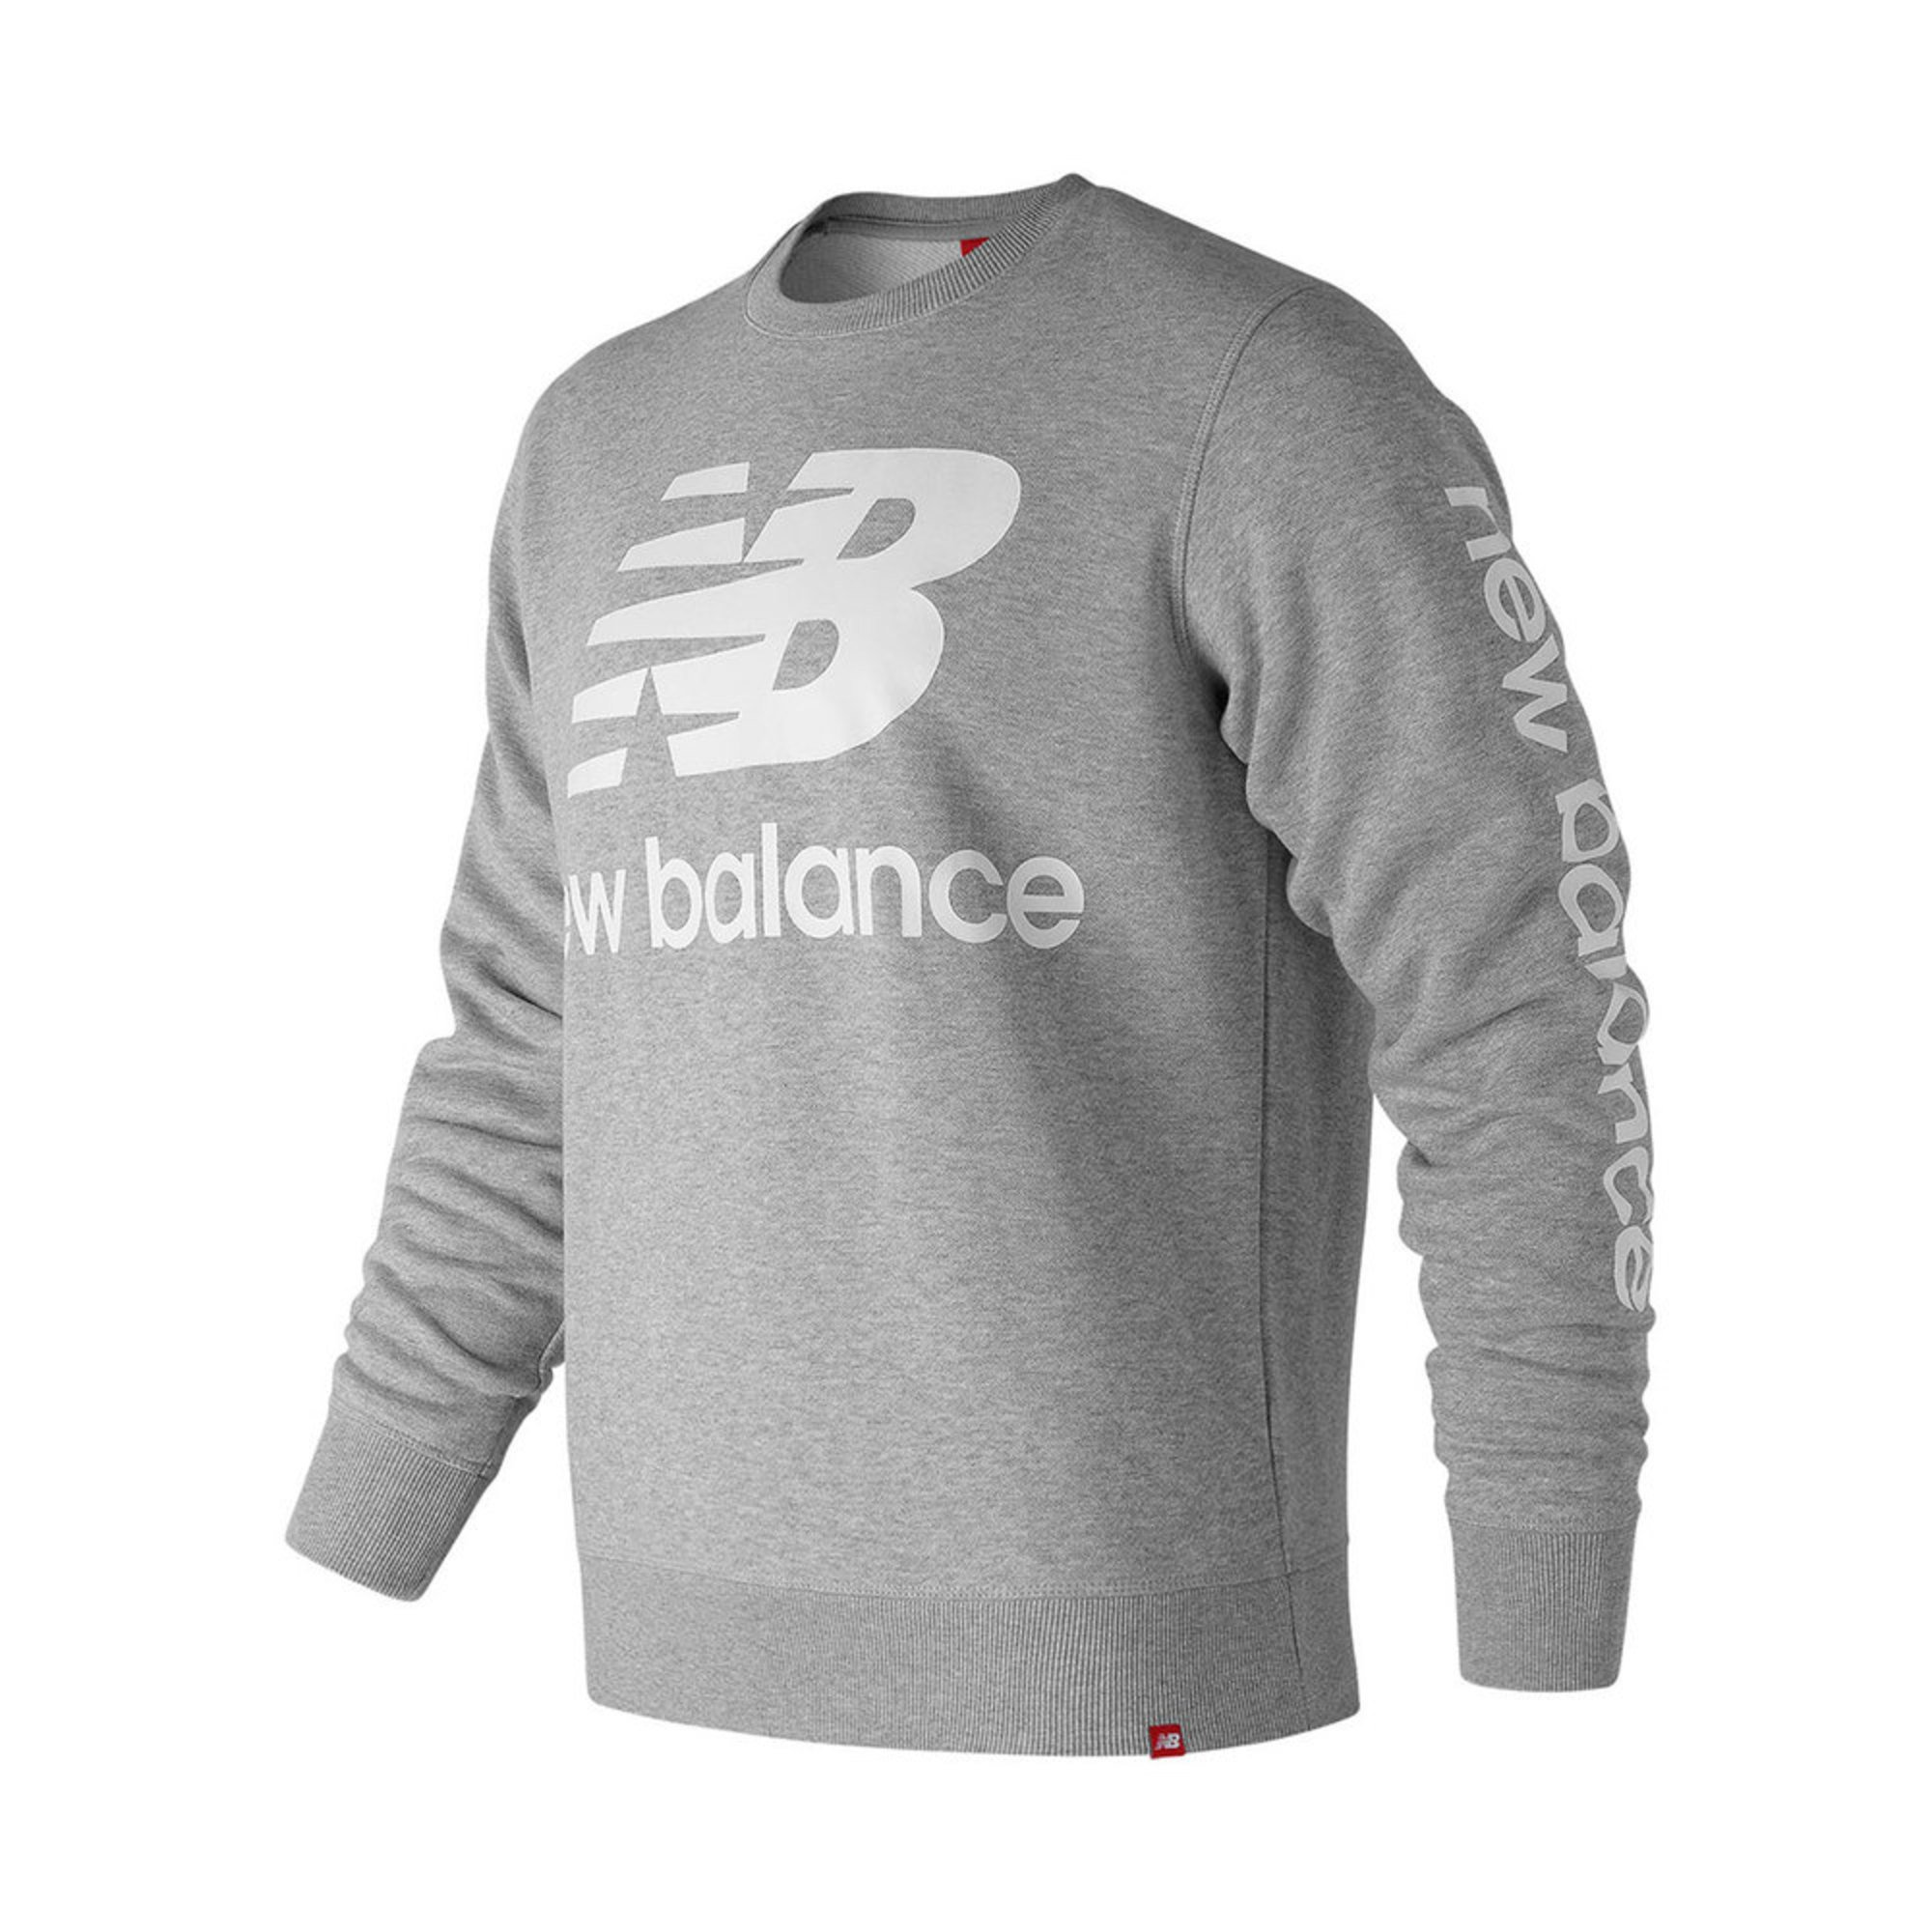 0c8544a28a8f6 New Balance Men's Essentials Logo Crew | Active Hoodies & Fleece ...